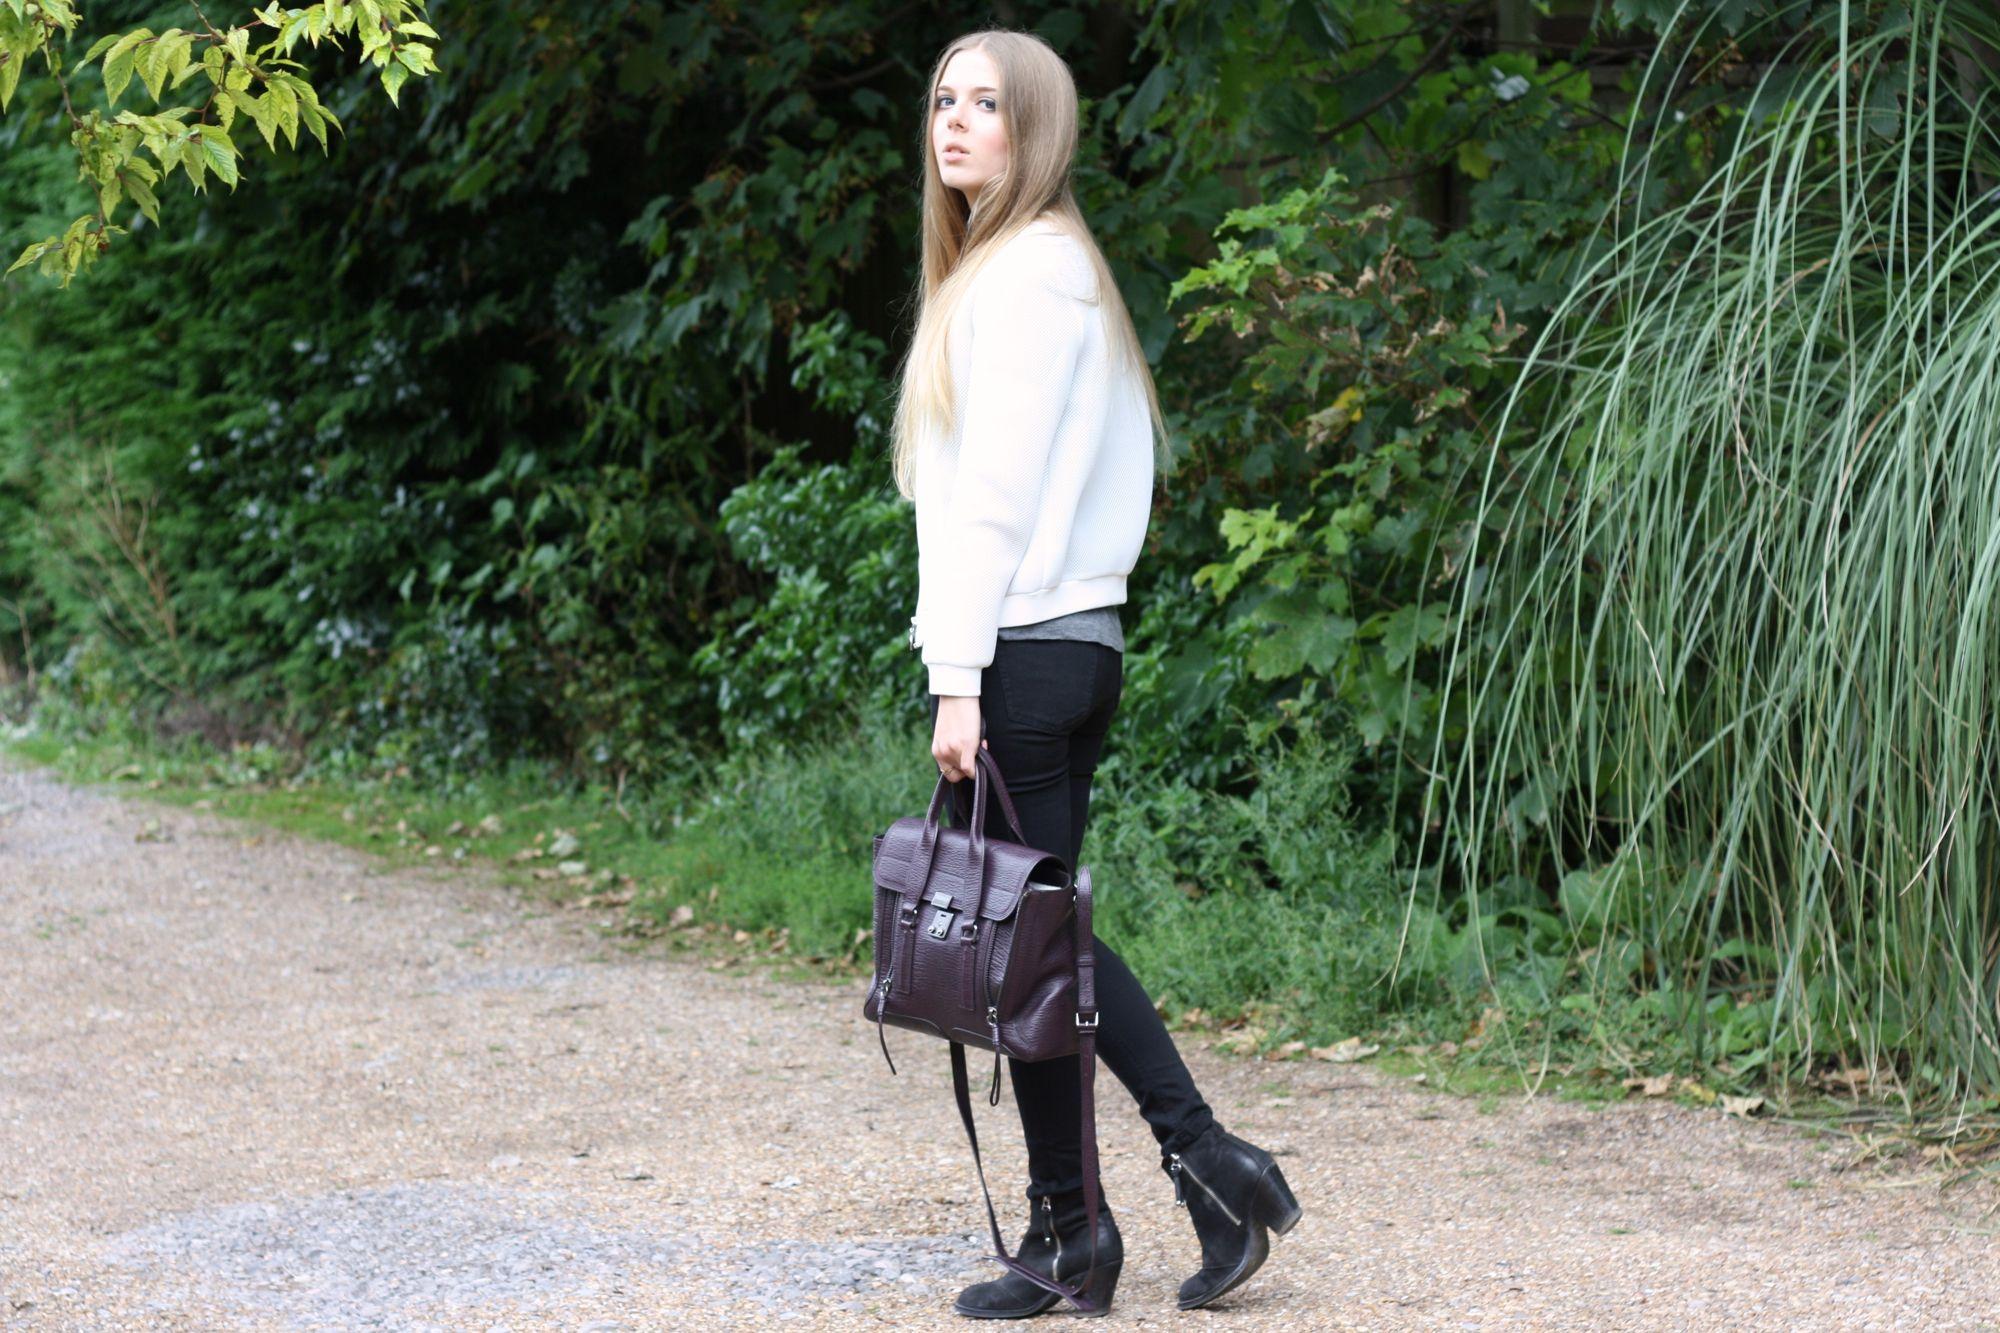 anna lou elliott | 31.08.14 wearing #Topshop white mesh bomber jacket, Topshop black ankle boots and #PhillipLim #Pashli burgundy medium #todayimwearing #ootd